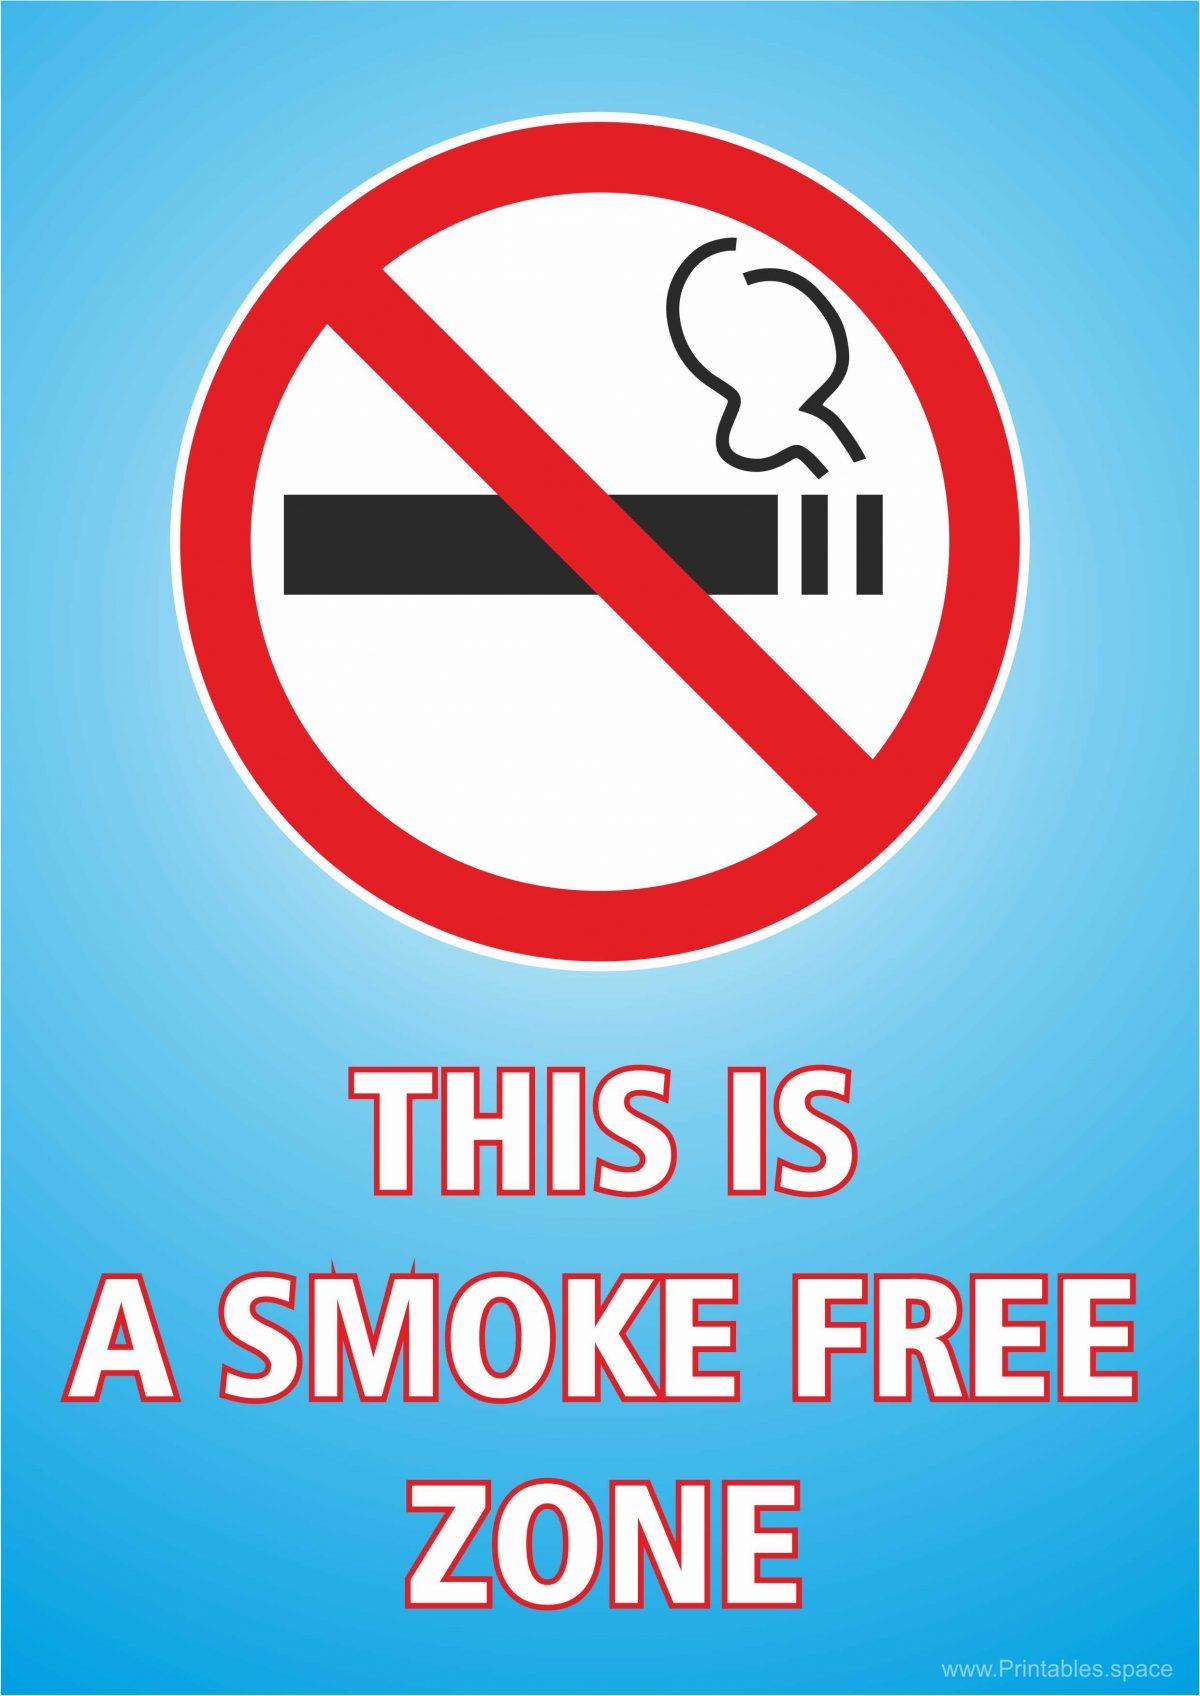 No smoking - This is a smoke free zone